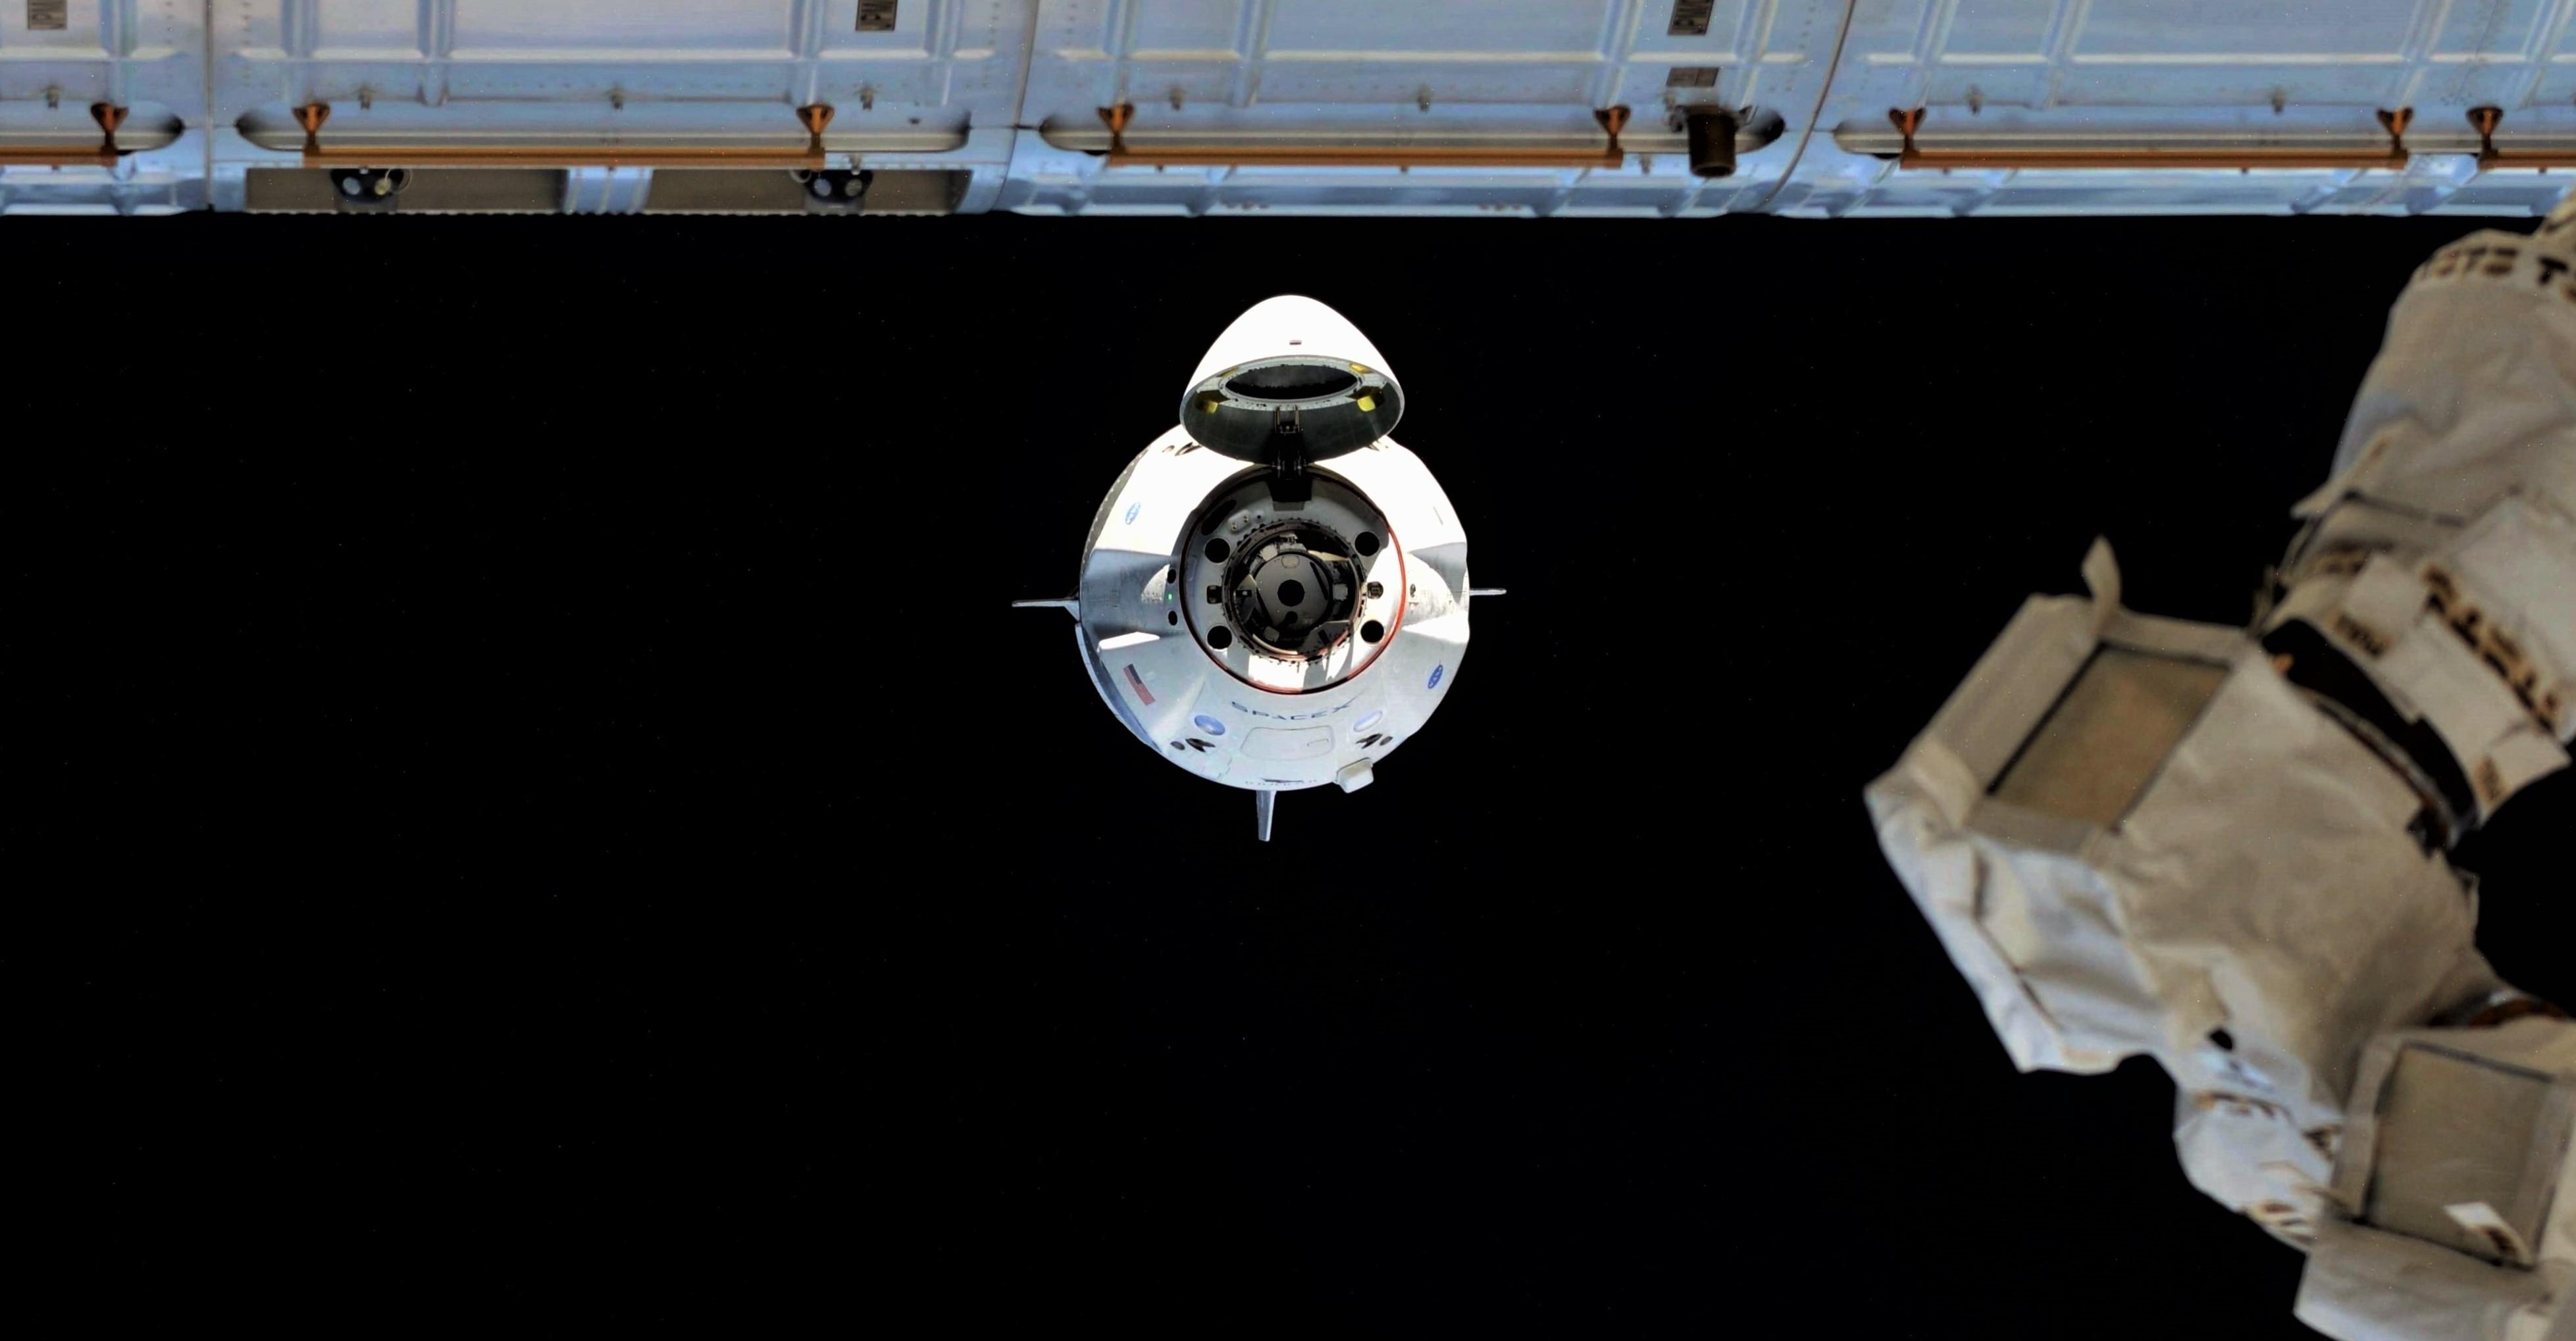 Crew Dragon DM-1 ISS arrival 030319 (Oleg Kononenko) 1 crop 3